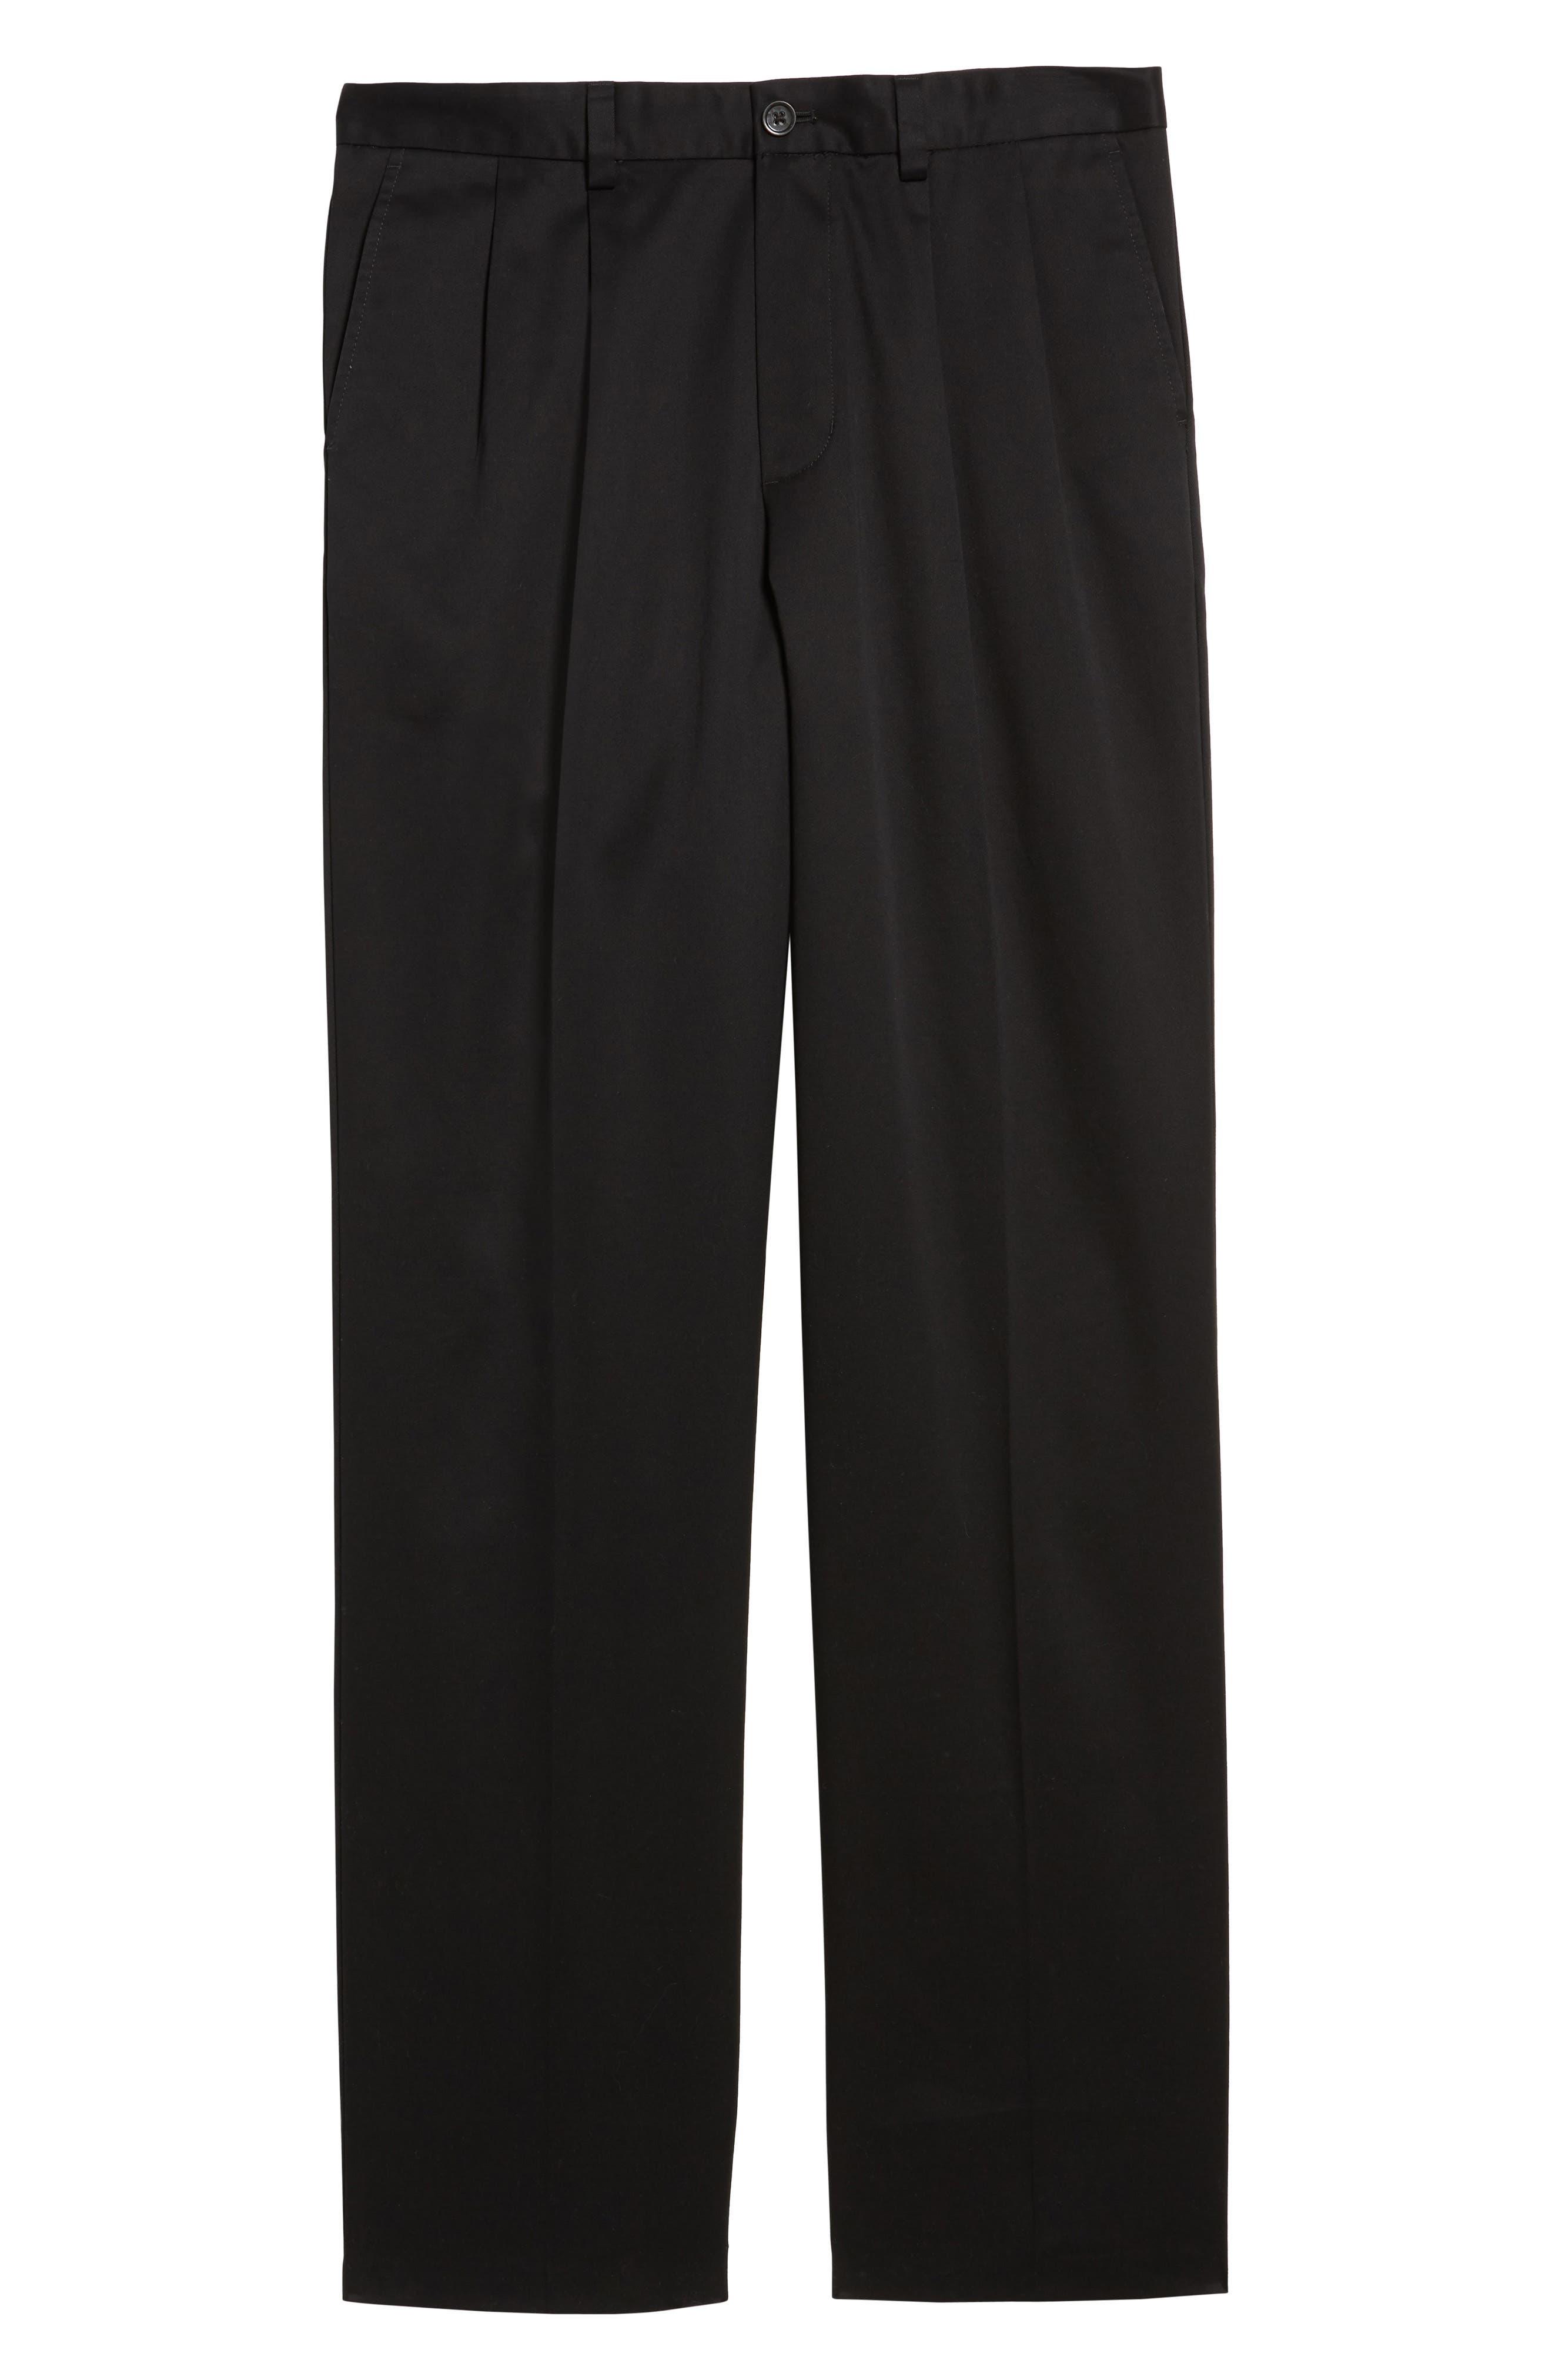 NORDSTROM MEN'S SHOP, 'Classic' Smartcare<sup>™</sup> Relaxed Fit Double Pleated Cotton Pants, Alternate thumbnail 7, color, BLACK